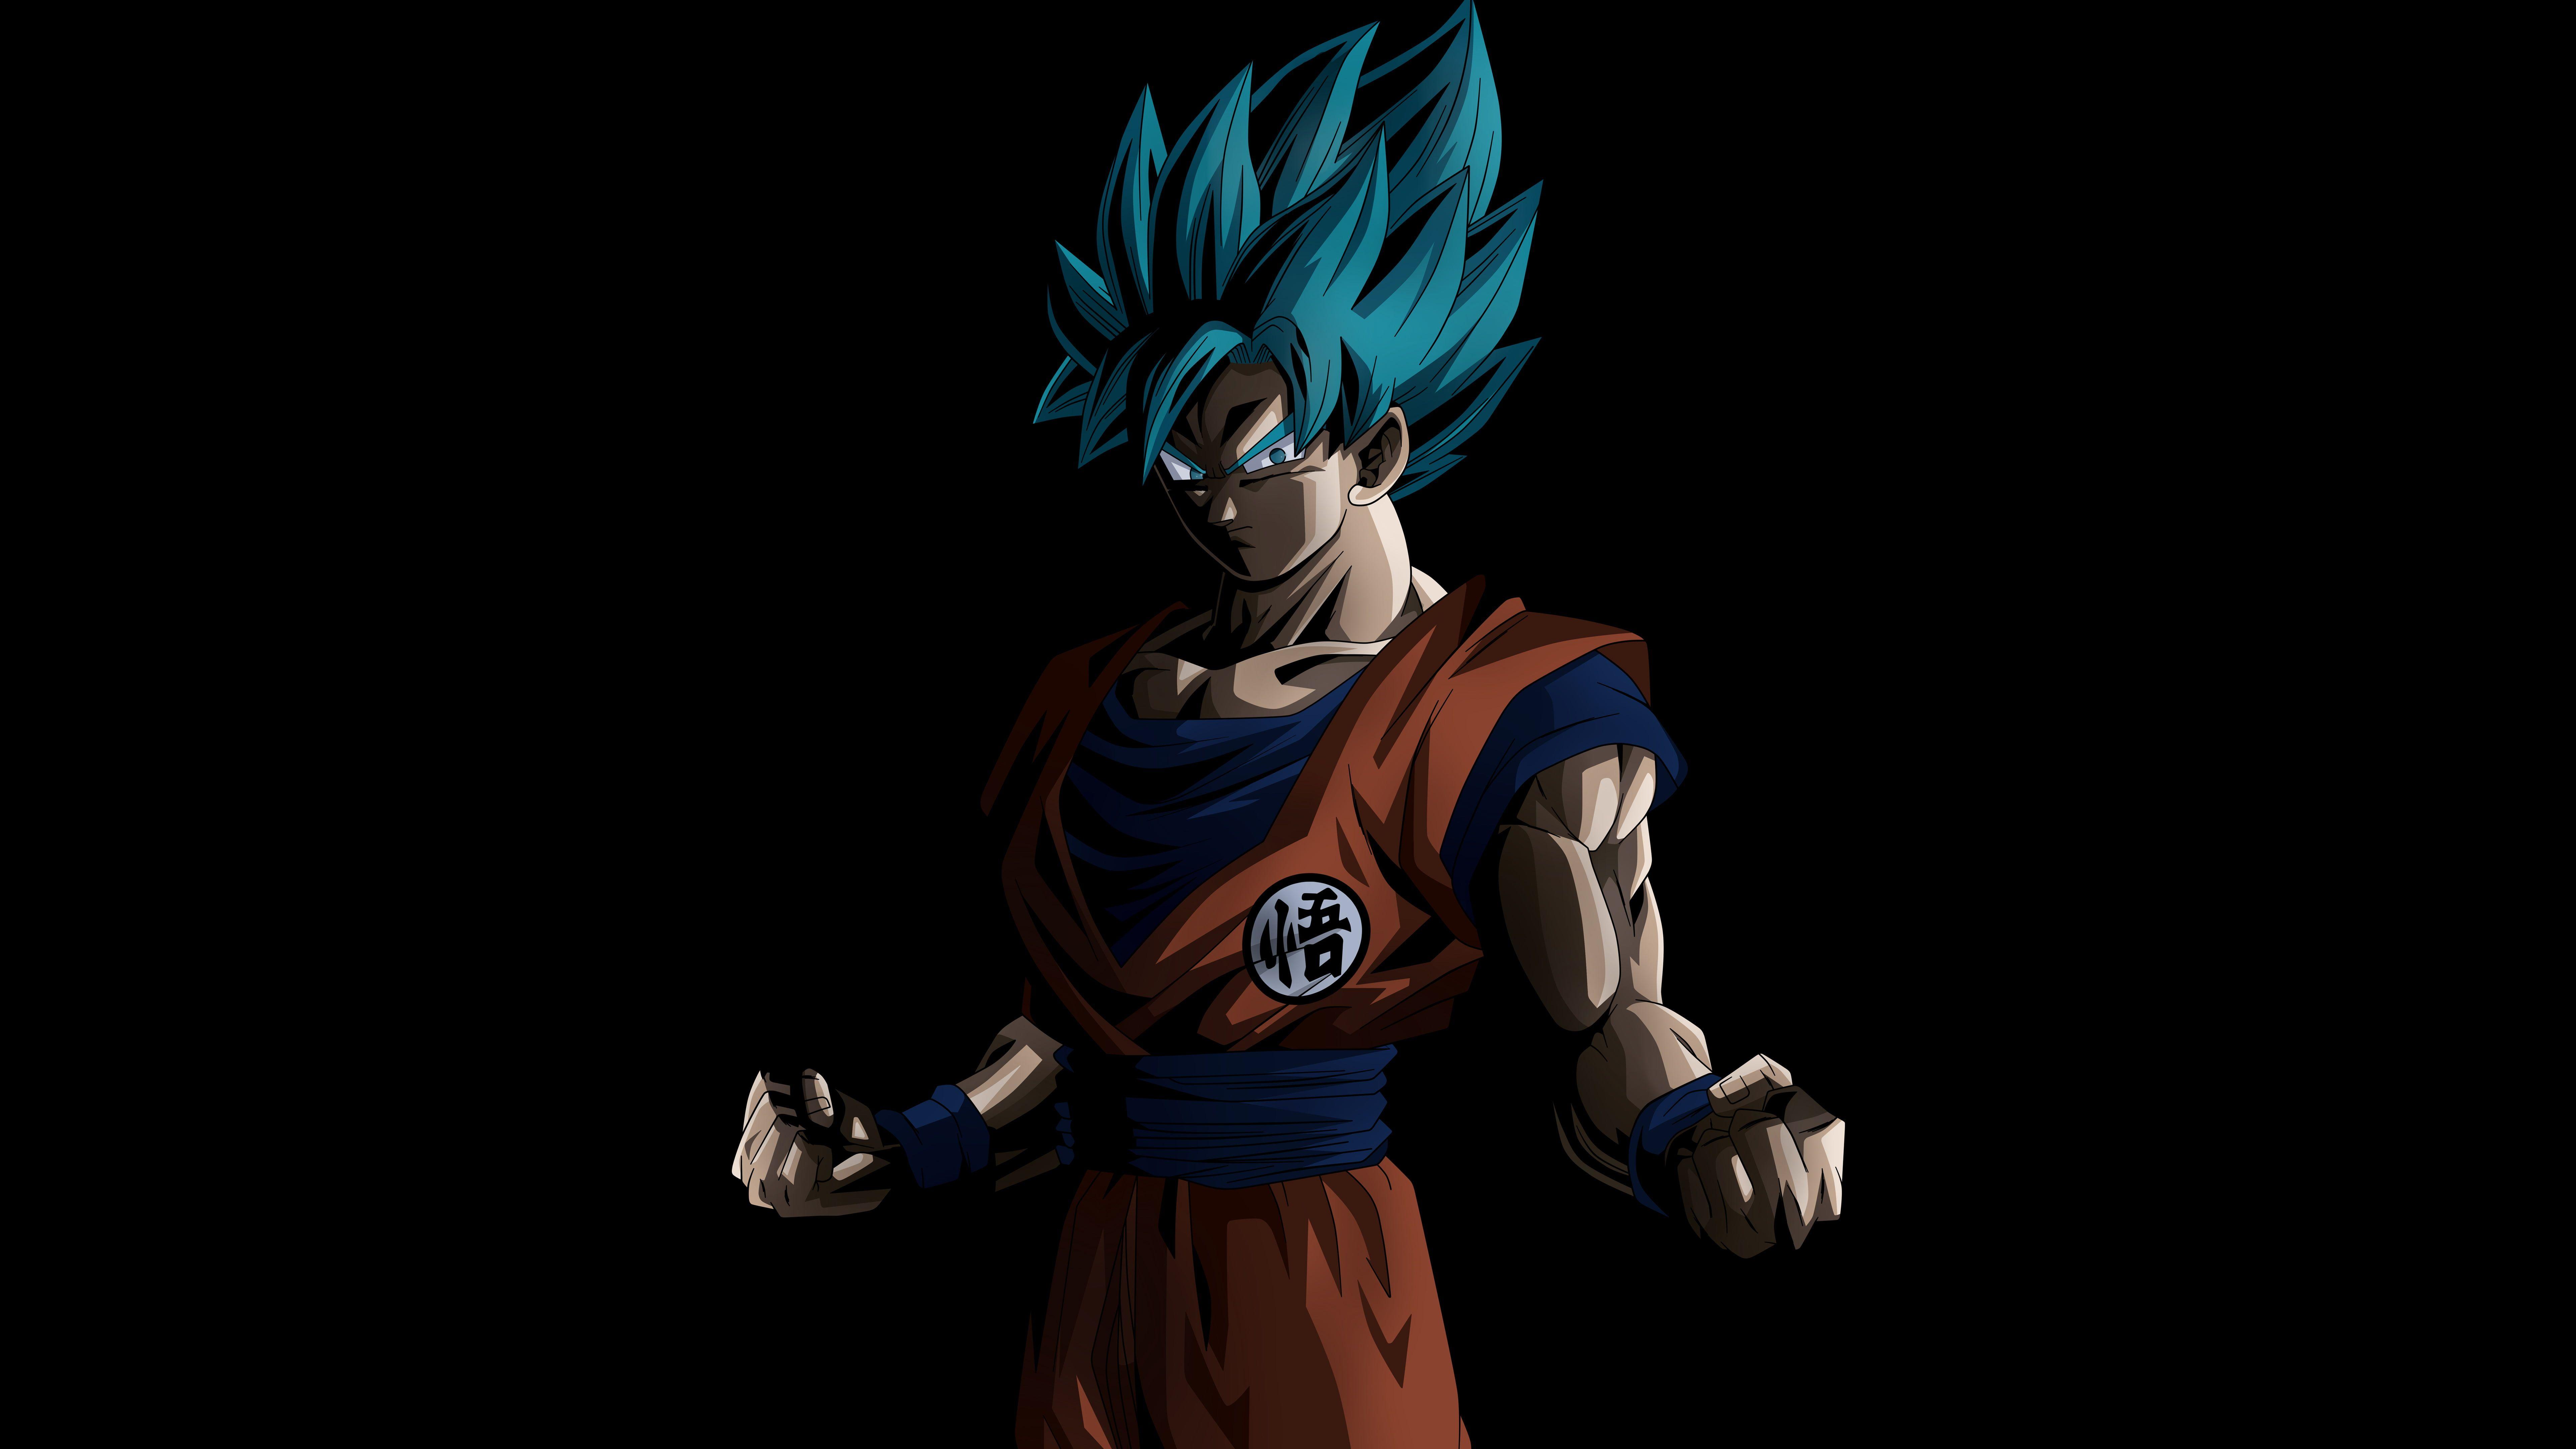 Wallpaper Dragon Ball Super 8k Goku Black 4k Goku Wallpaper Goku Super Saiyan Blue Dragon Ball Wallpapers